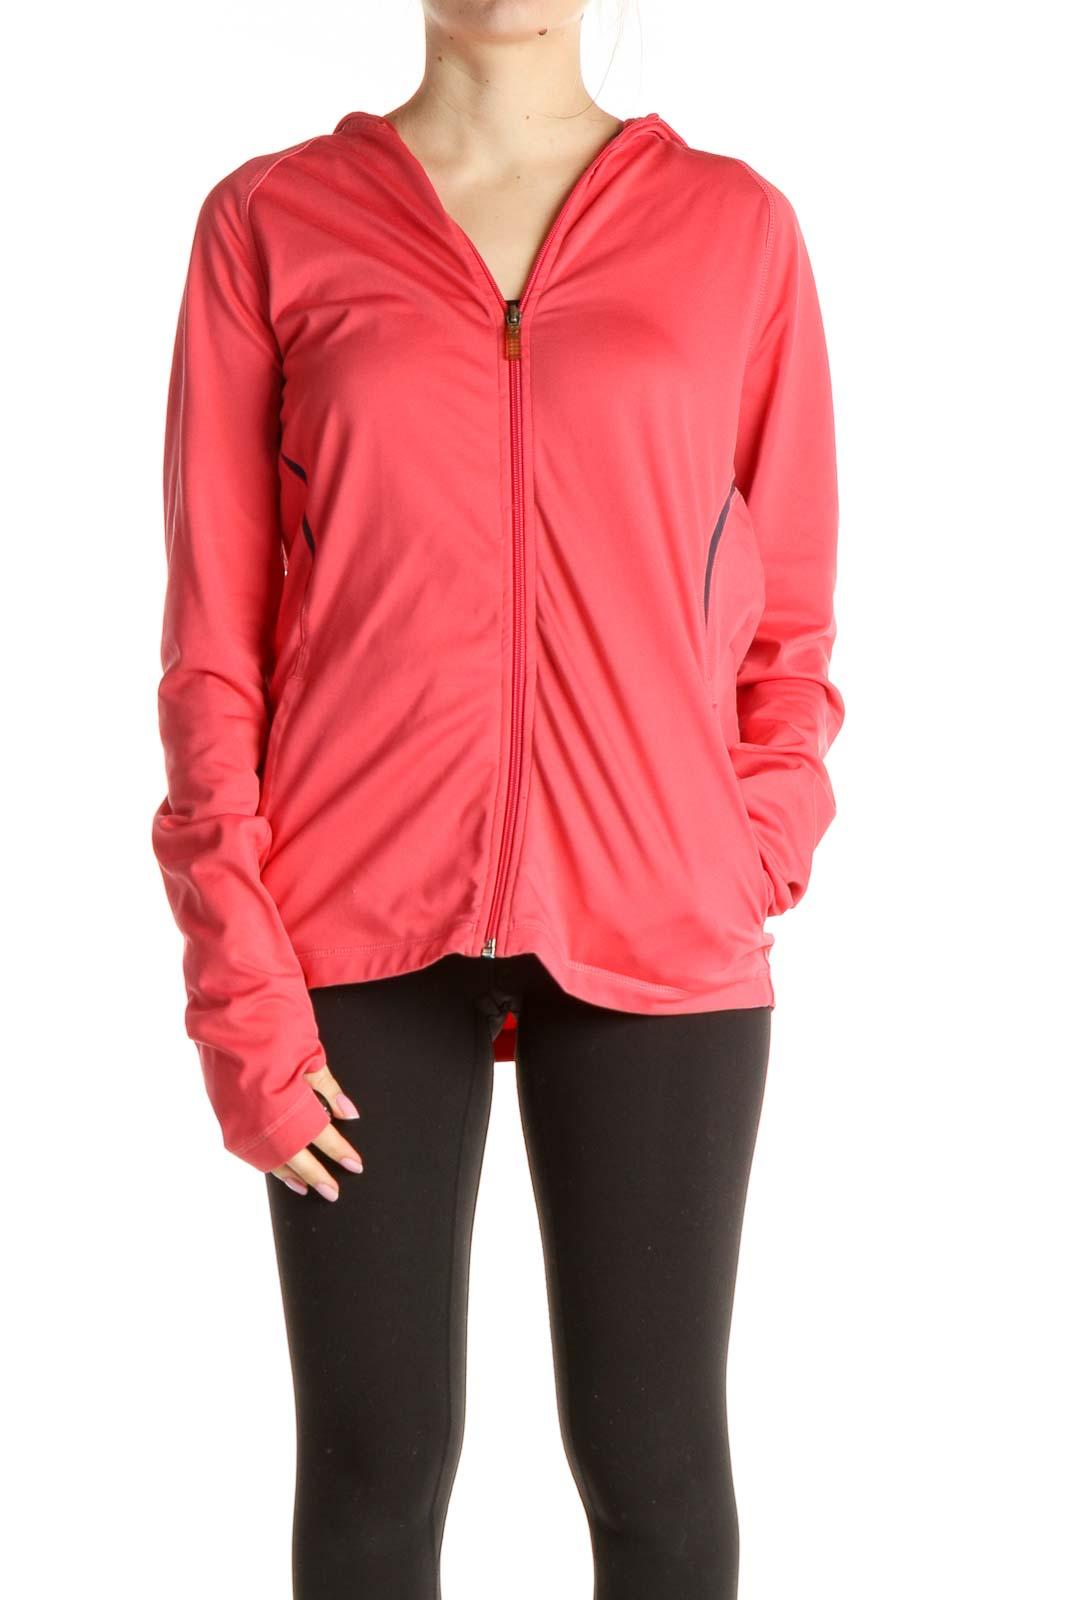 Pink Activewear Jacket Front